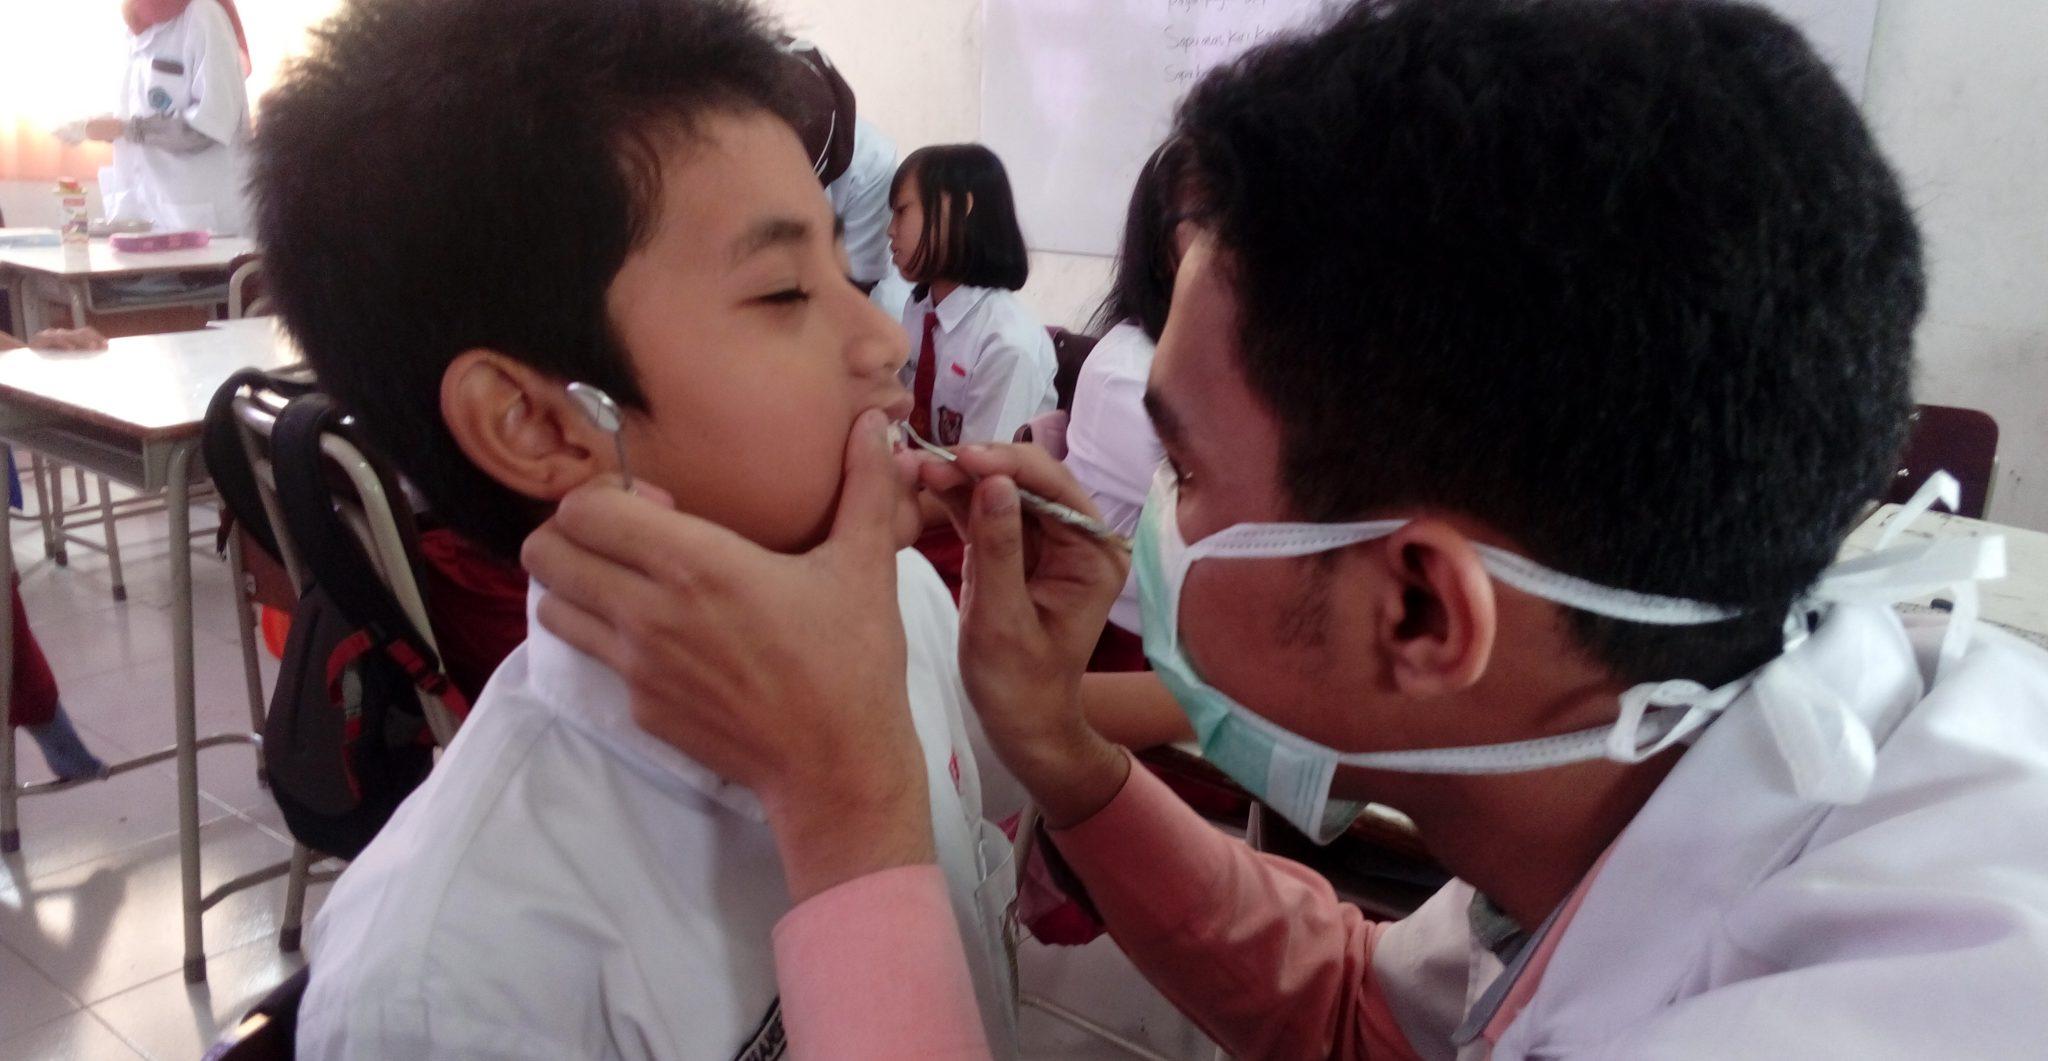 Ratusan Siswa SD Labschool UNNES Ikuti Pemerikasaan Gigi